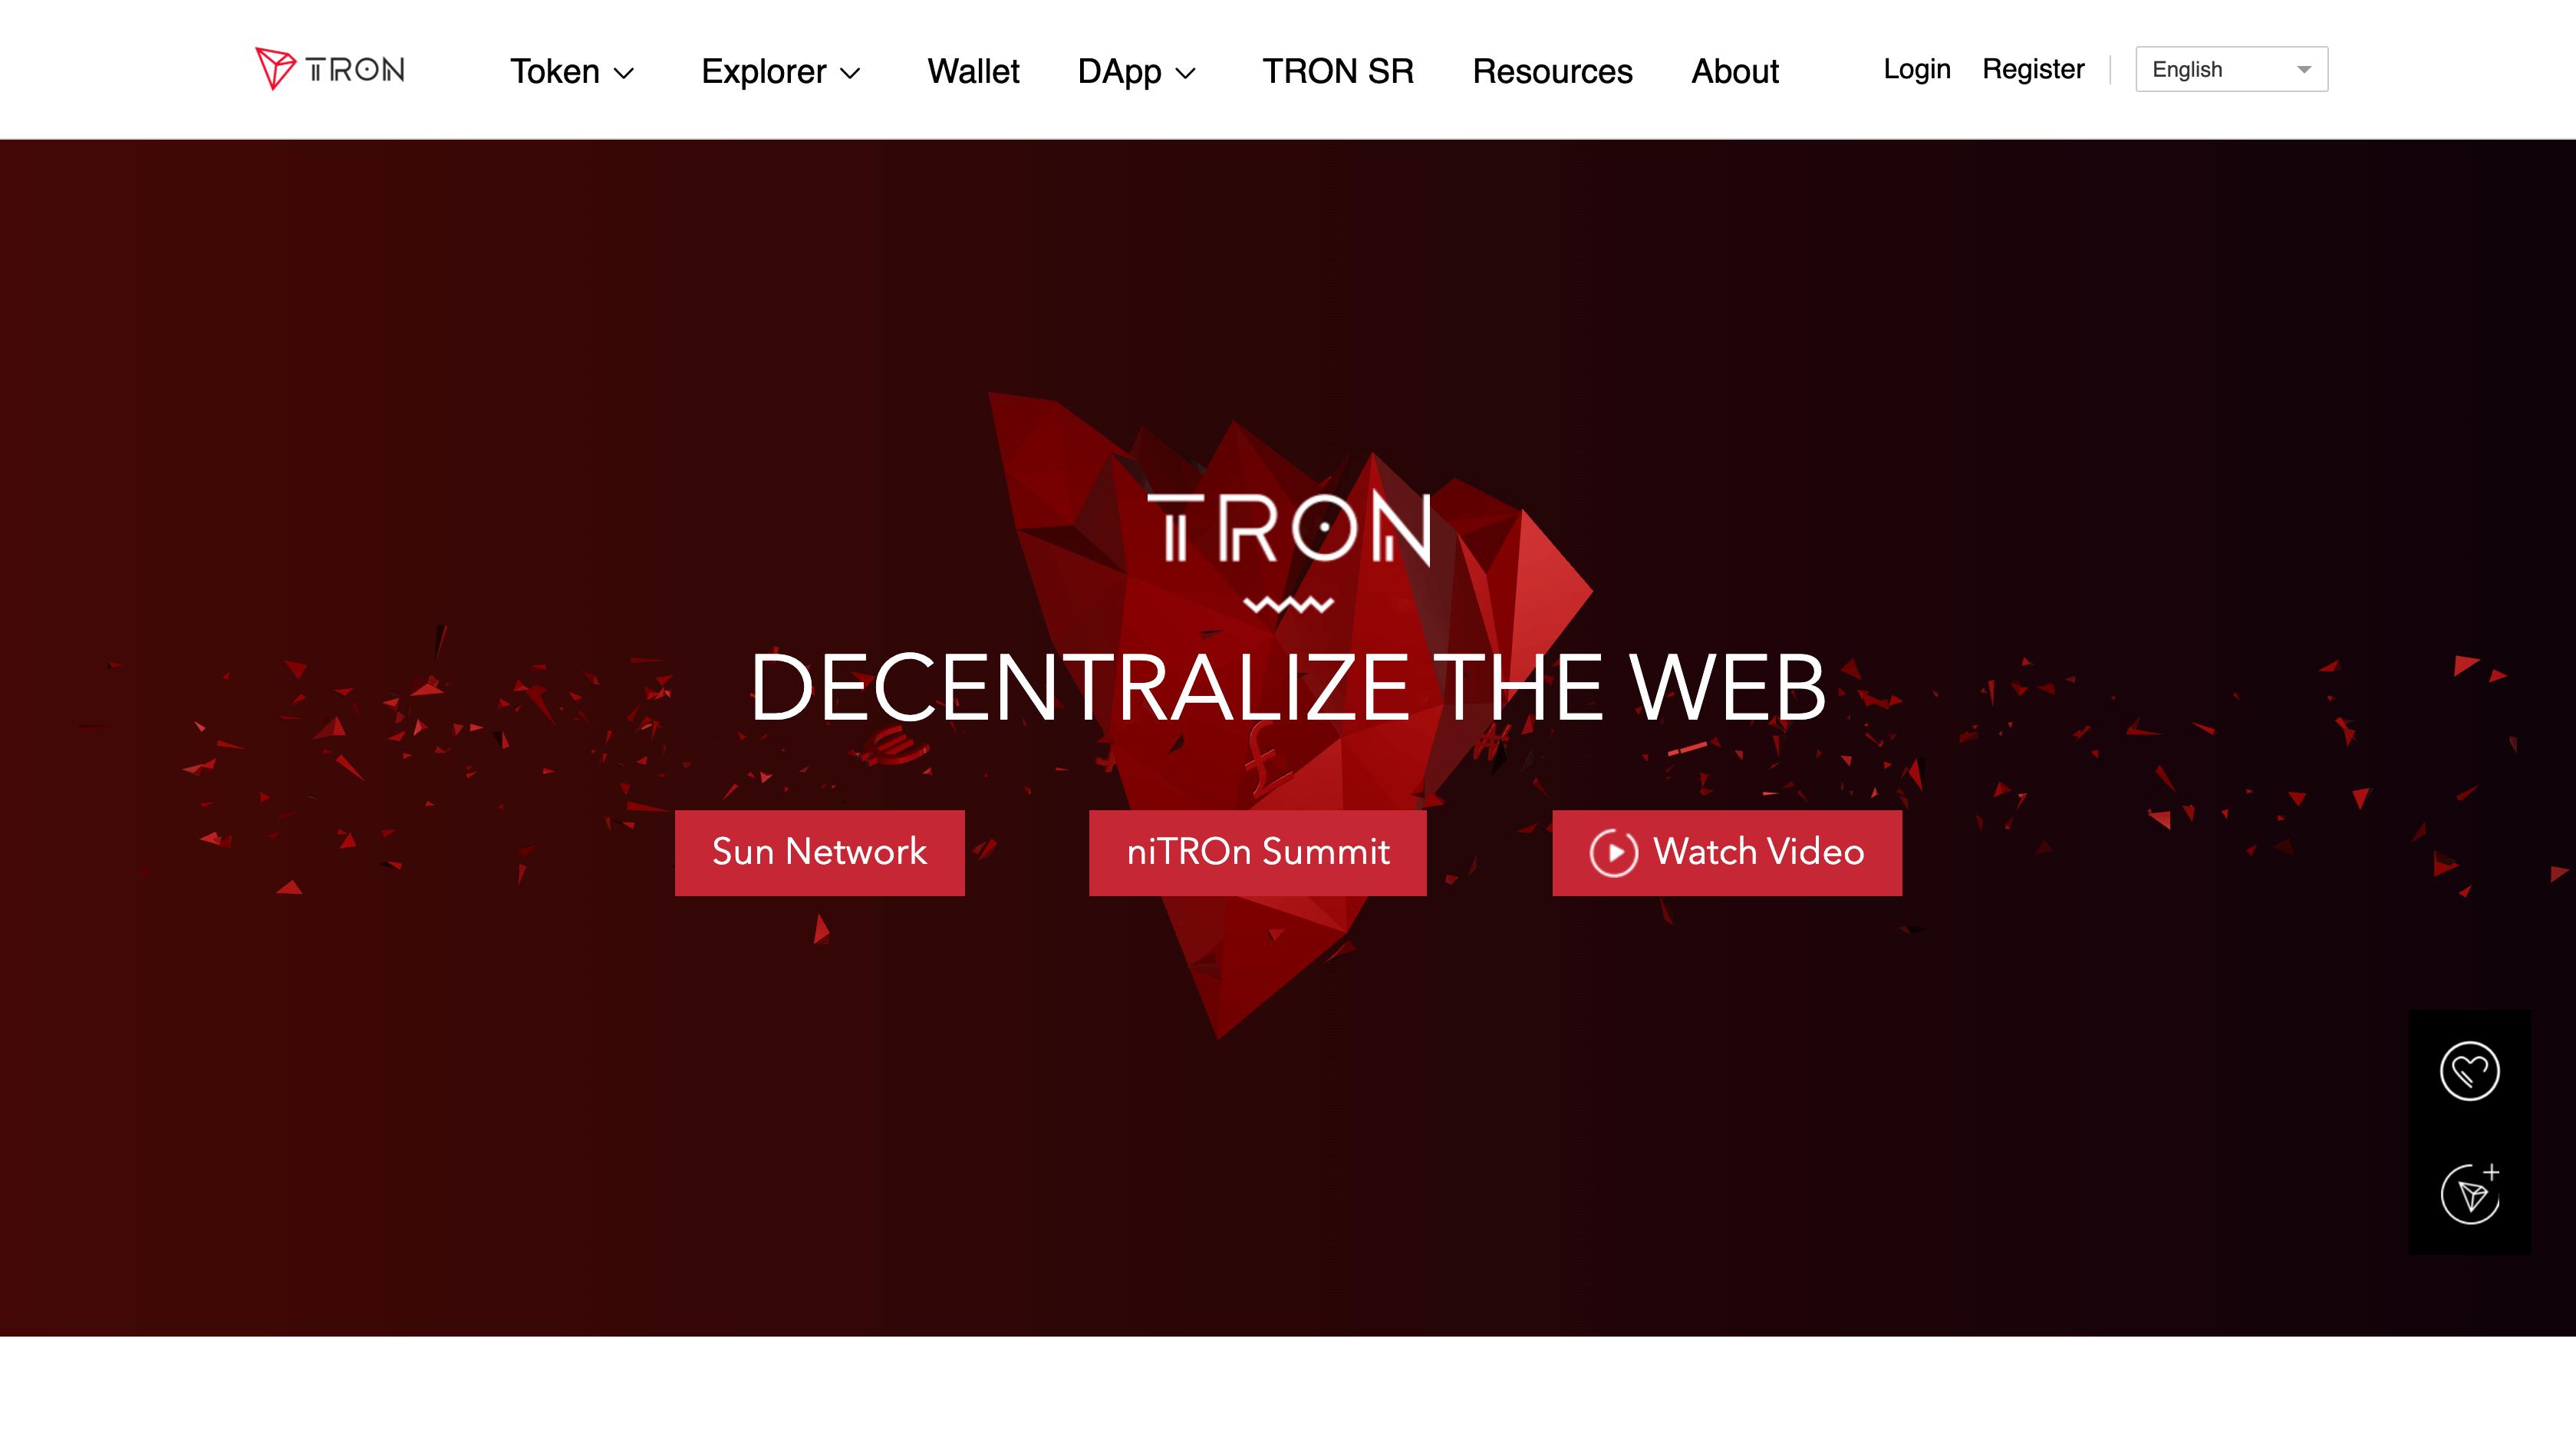 buy Tron or not